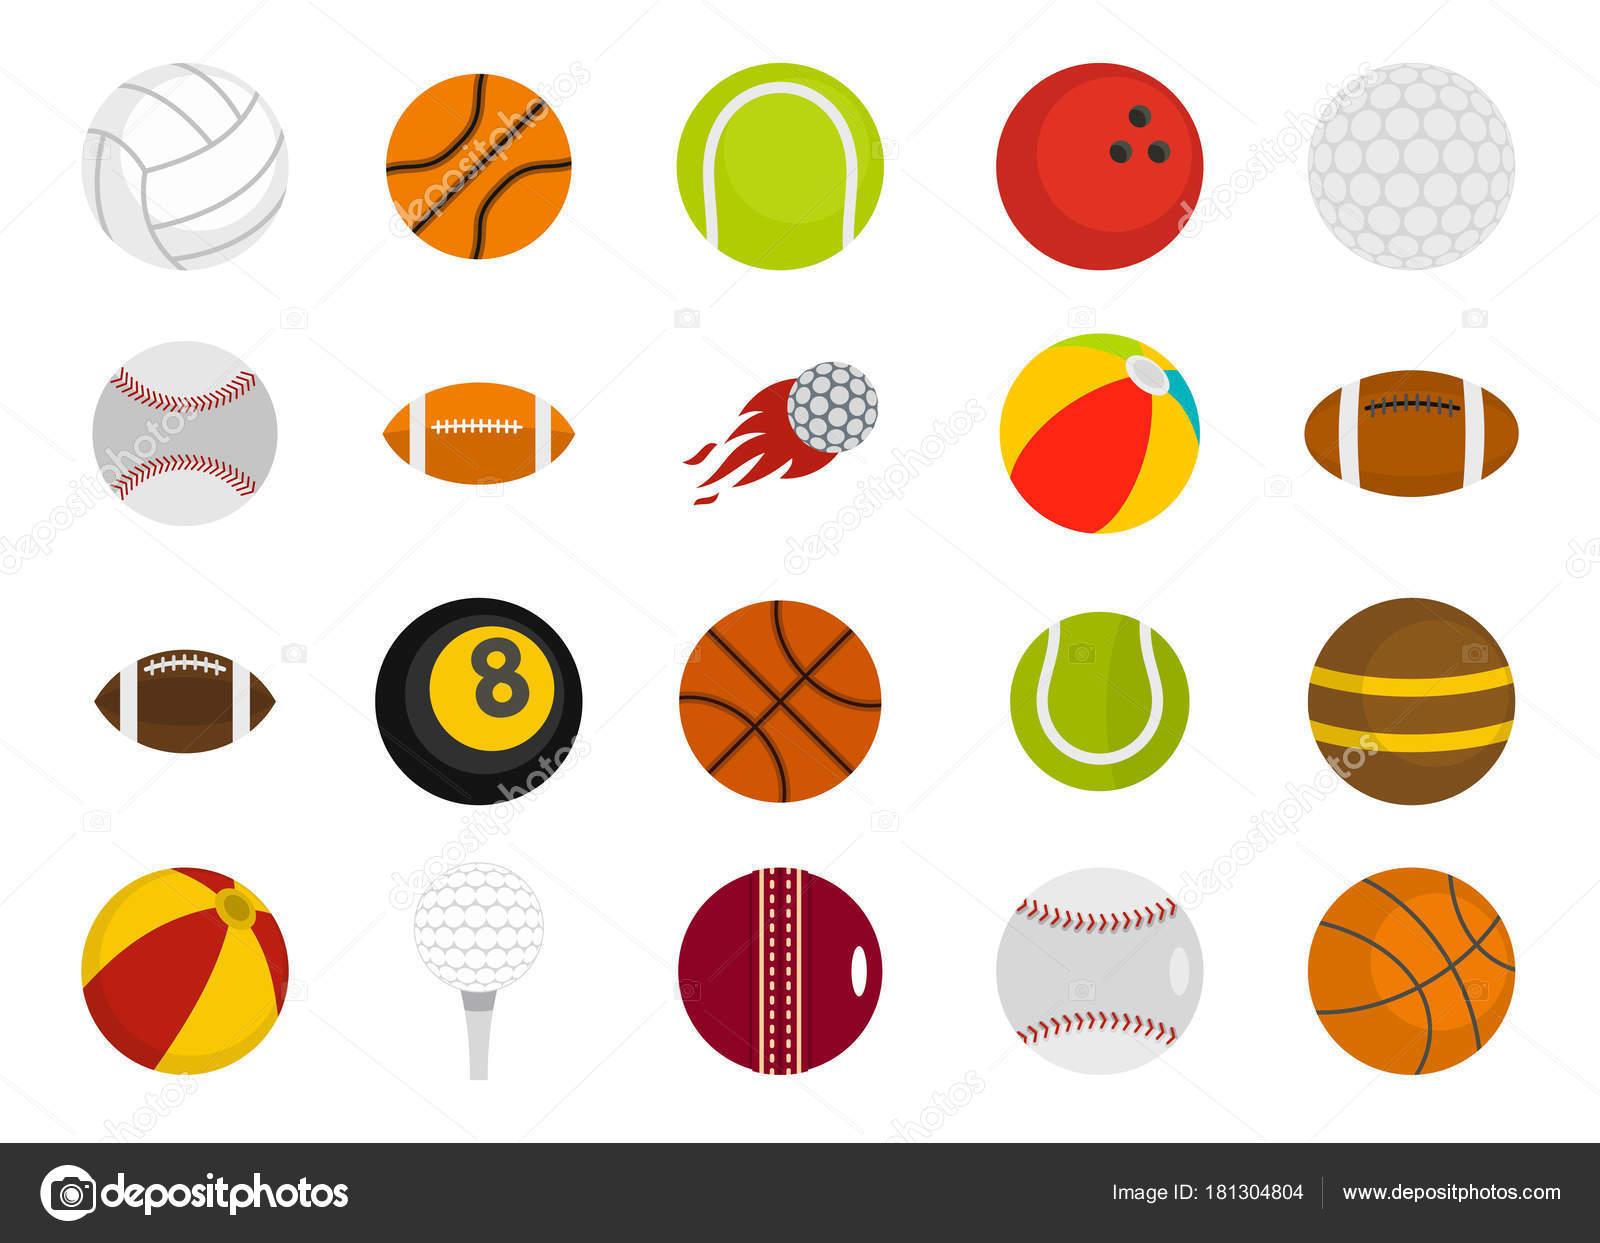 b6b8b5da372 Conjunto de iconos de deporte pelotas. Plano conjunto de deporte pelotas  vector iconos para diseño web aislado sobre fondo blanco — Vector de  ylivdesign